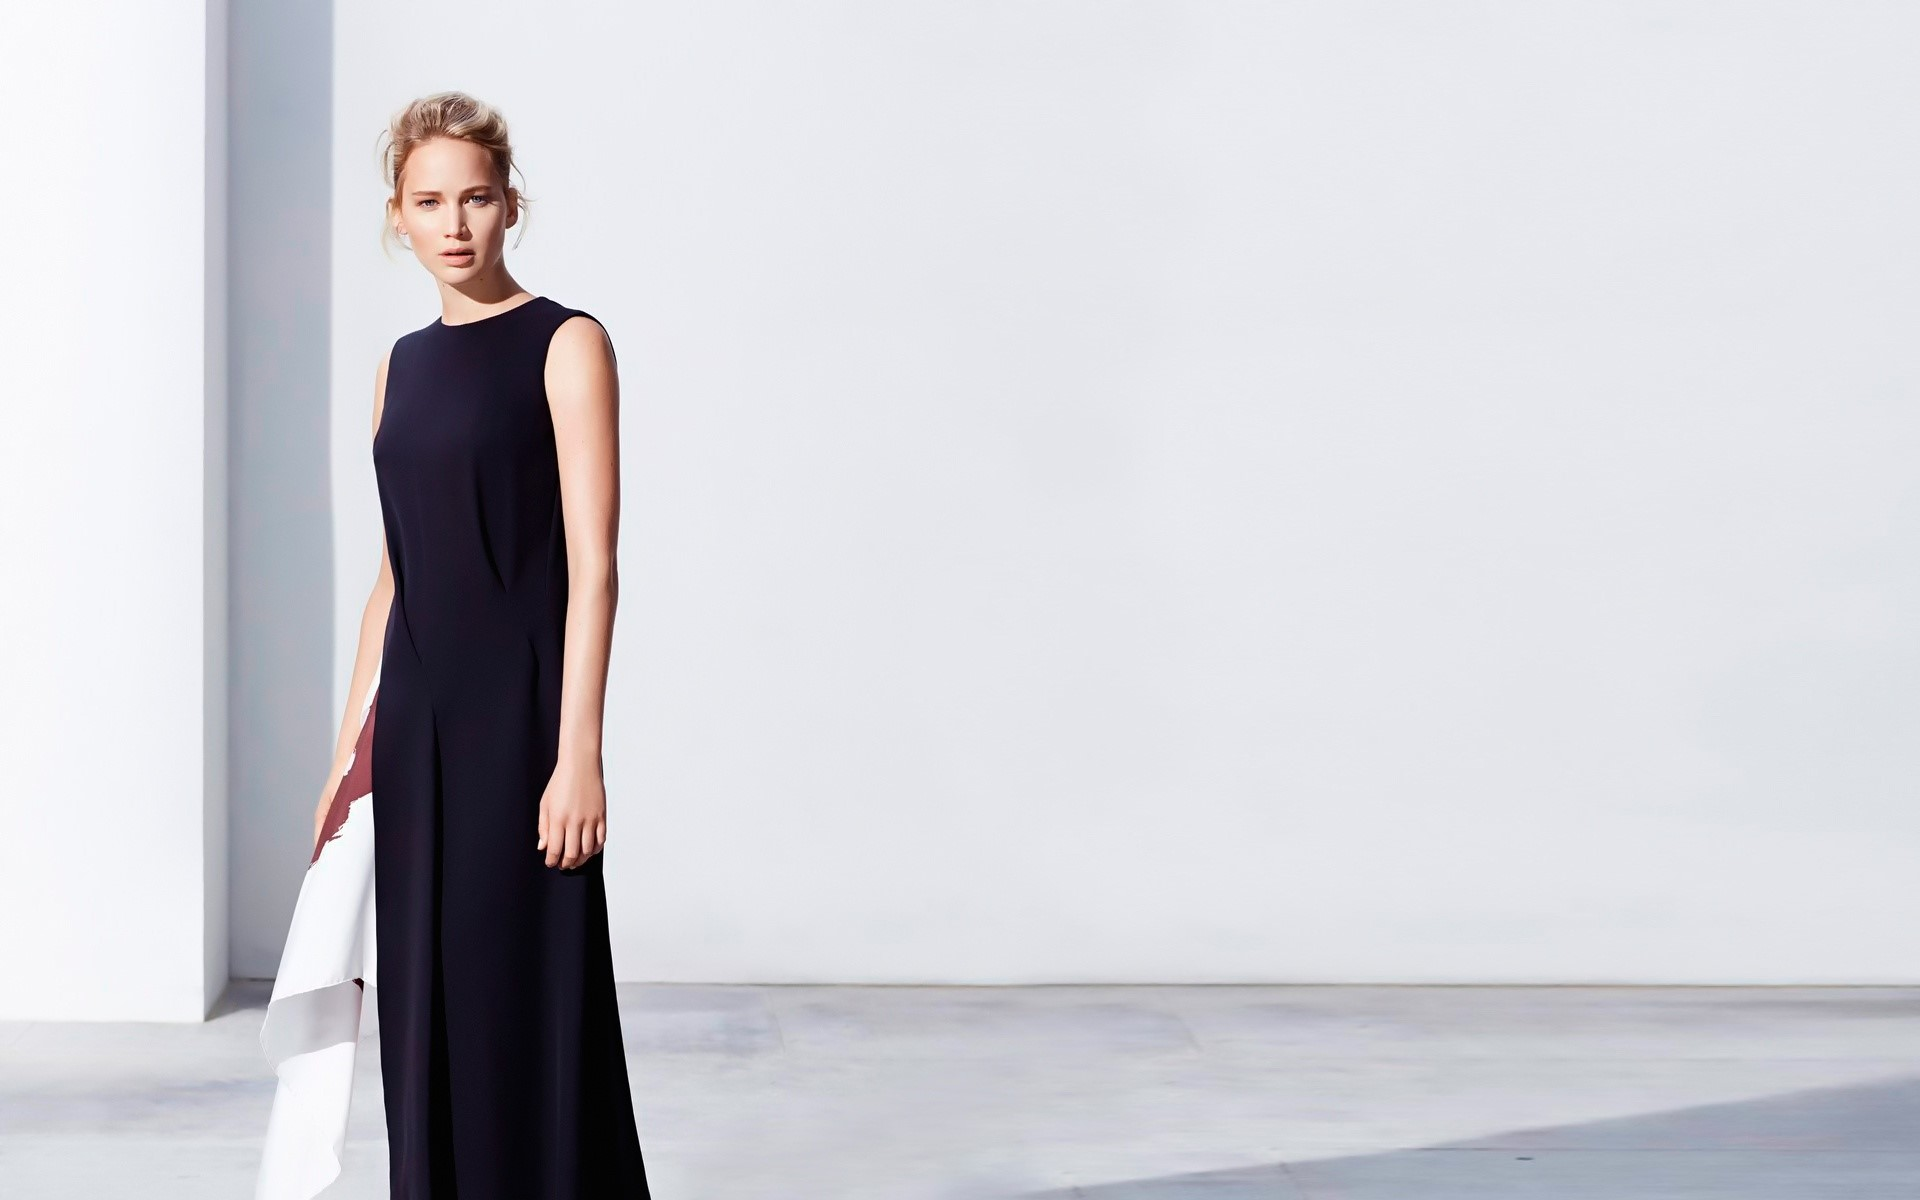 Fondos de pantalla Jennifer Lawrene con un vestido negro